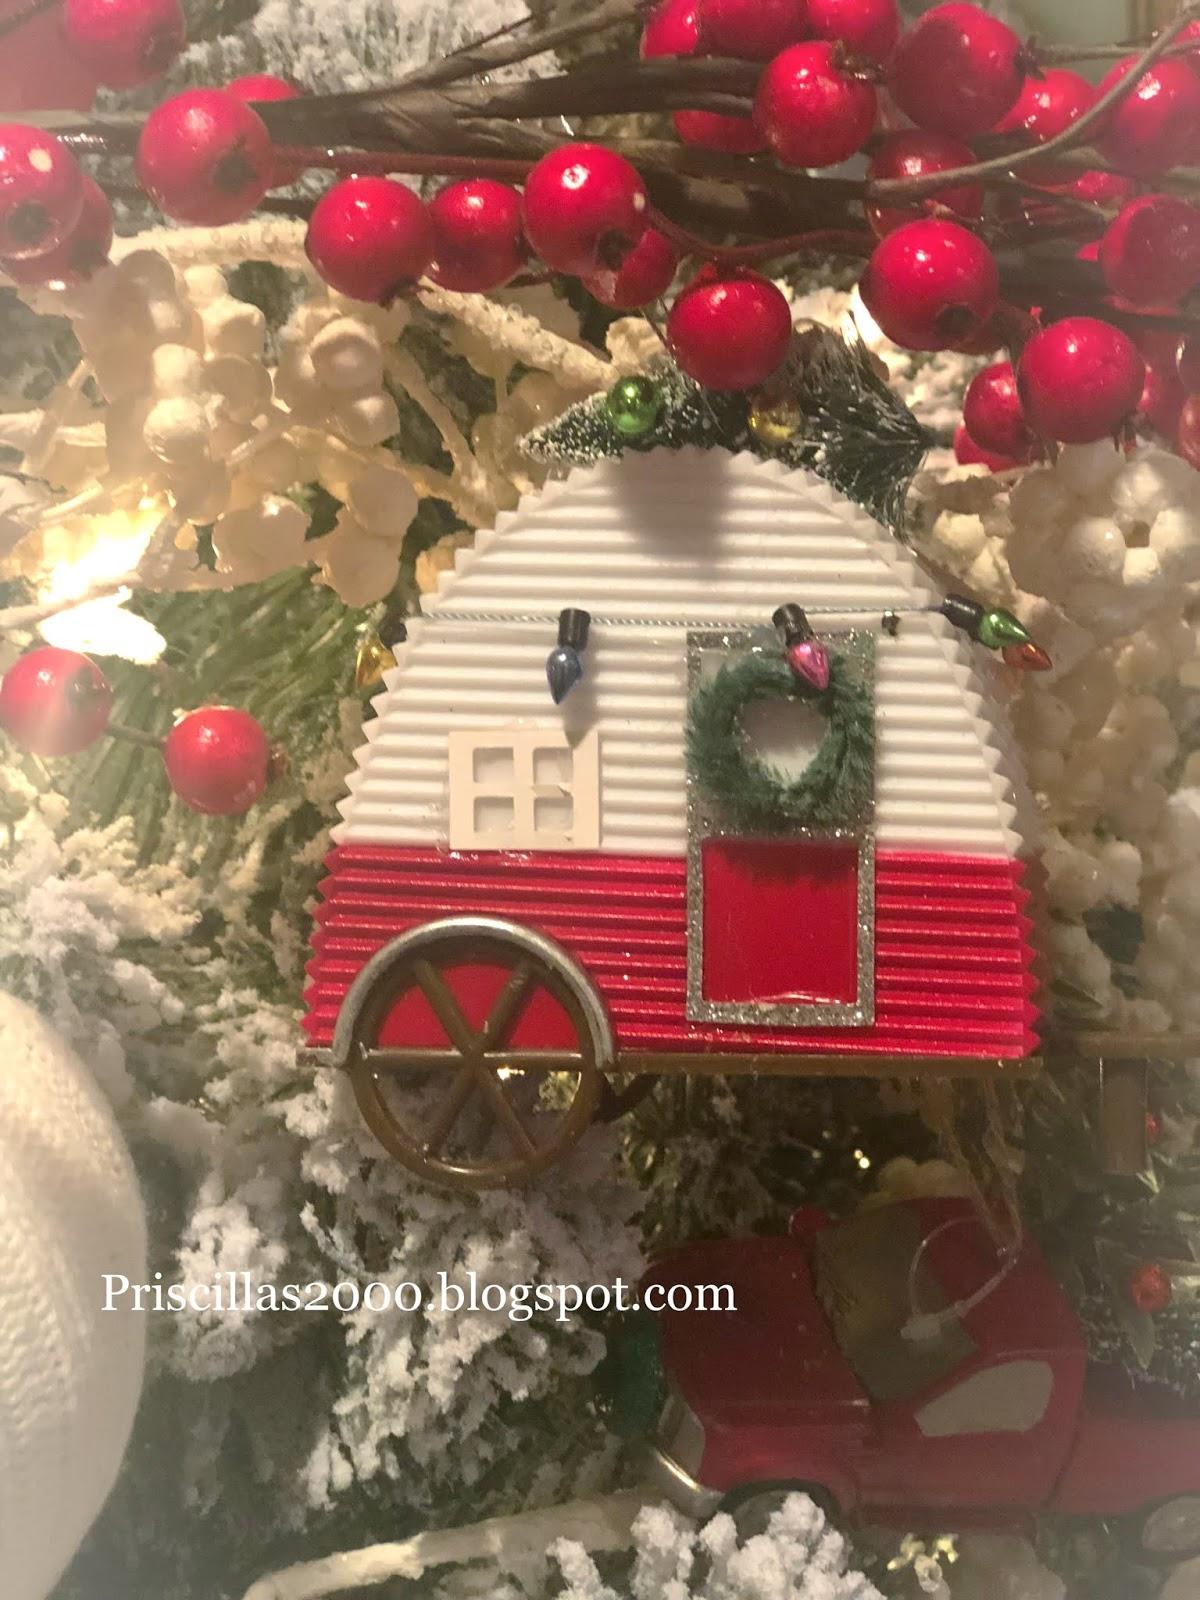 Priscillas Red Truck Christmas Tree